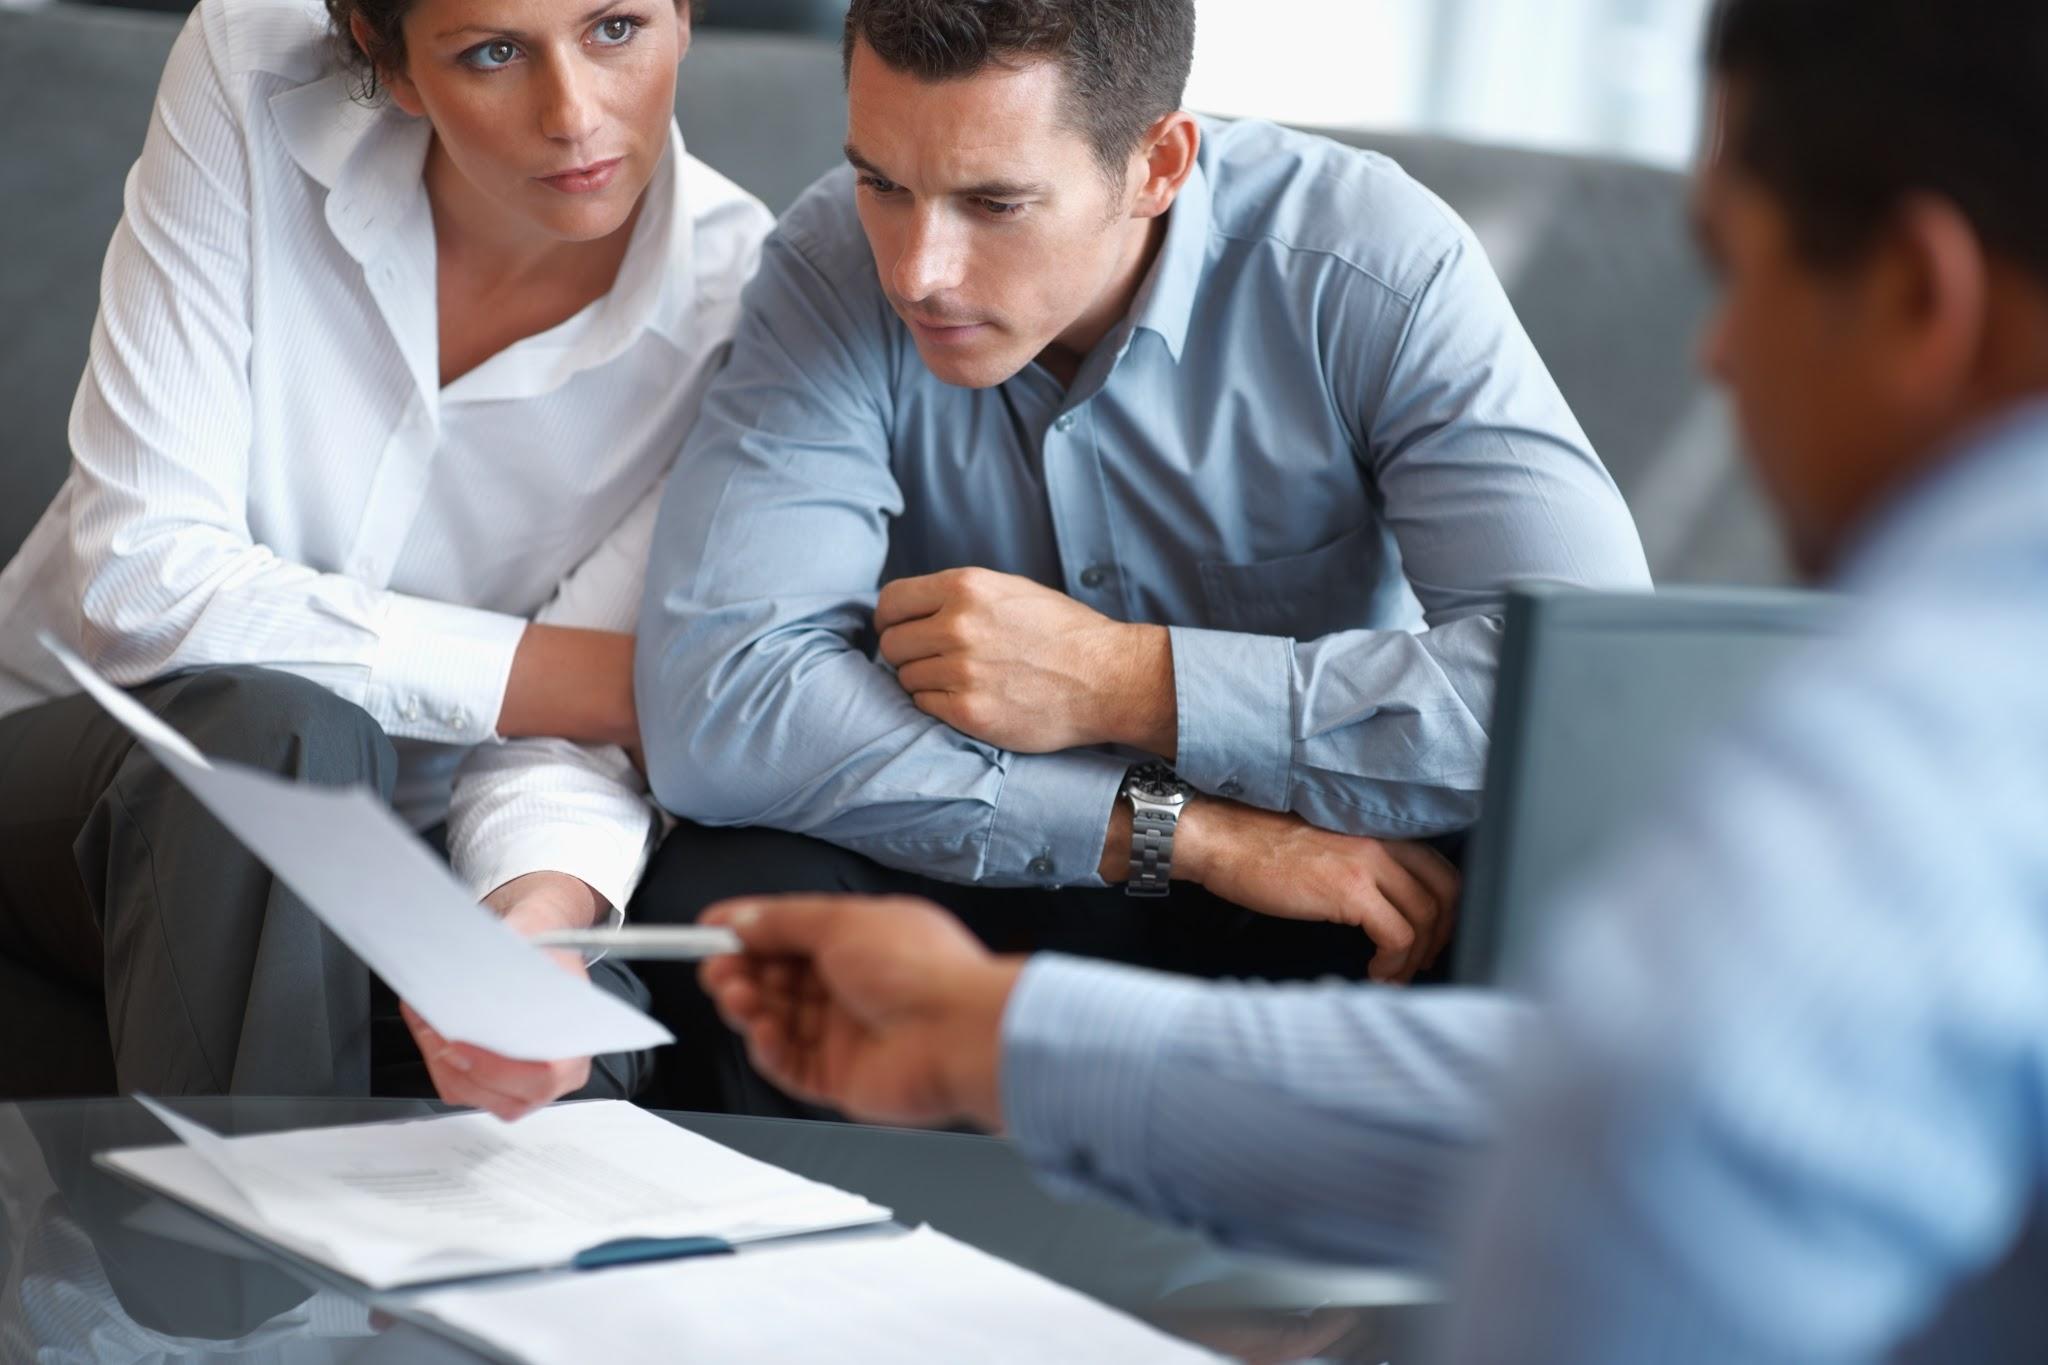 Получение кредита для малого бизнеса без залога